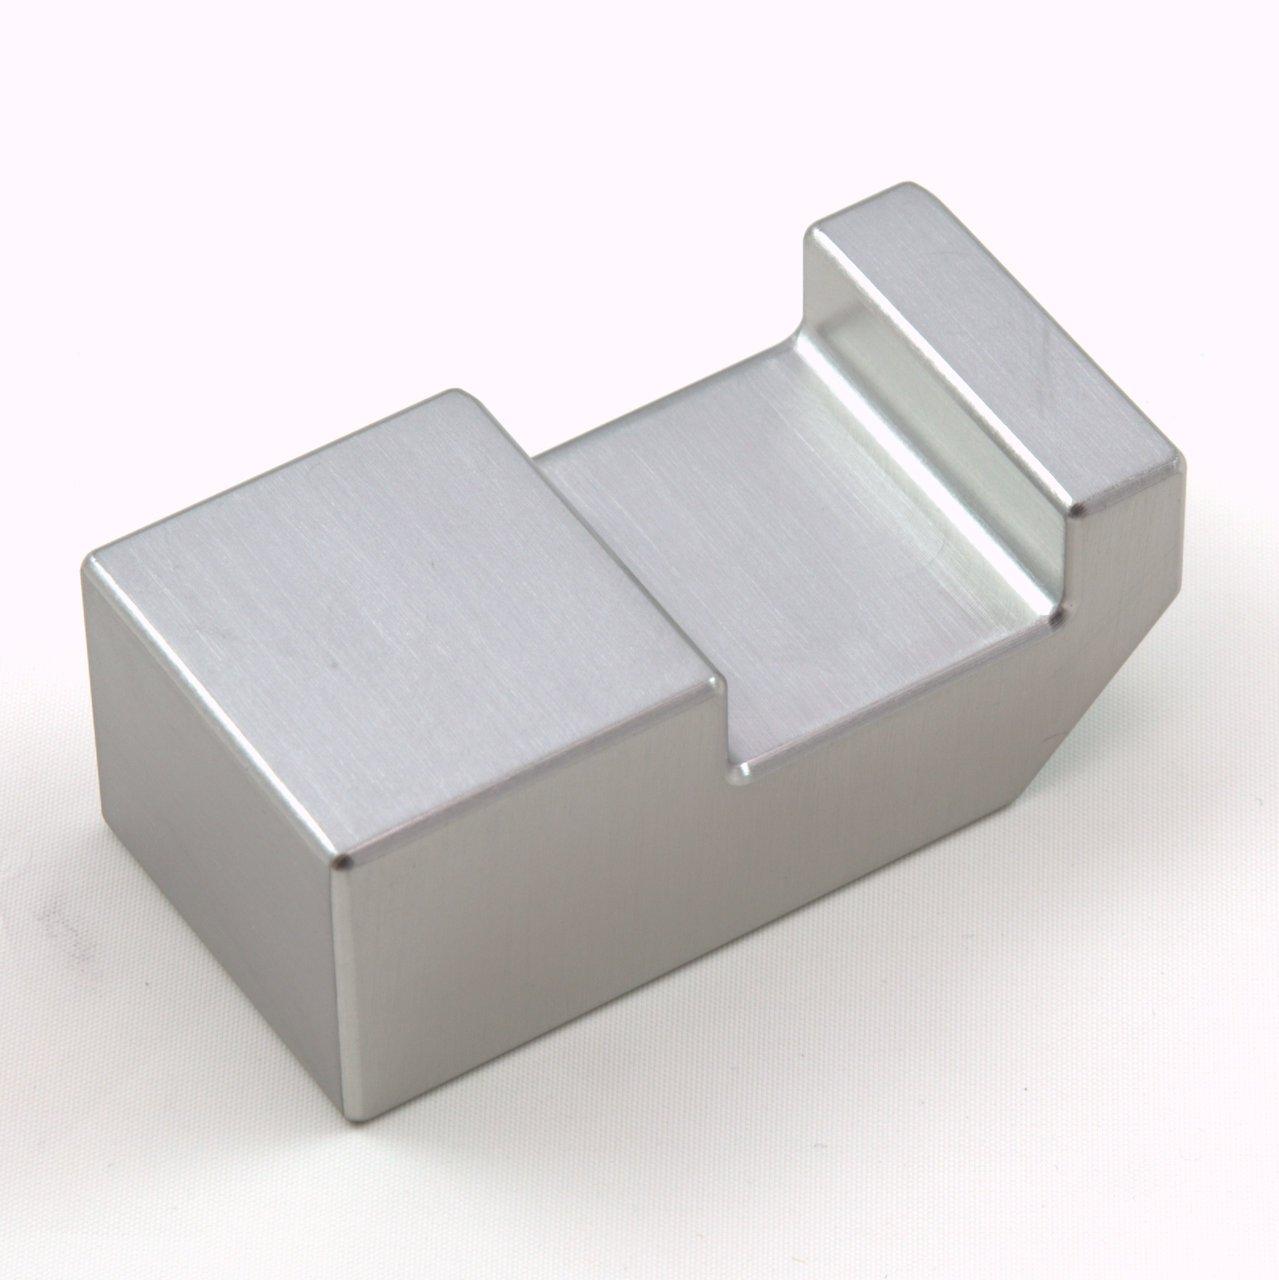 Tungsten Ergonomic Bucking Bar BB-13: 1.64 lbs, Notched Side, 1.0'' x 1.25'' x 2.5''